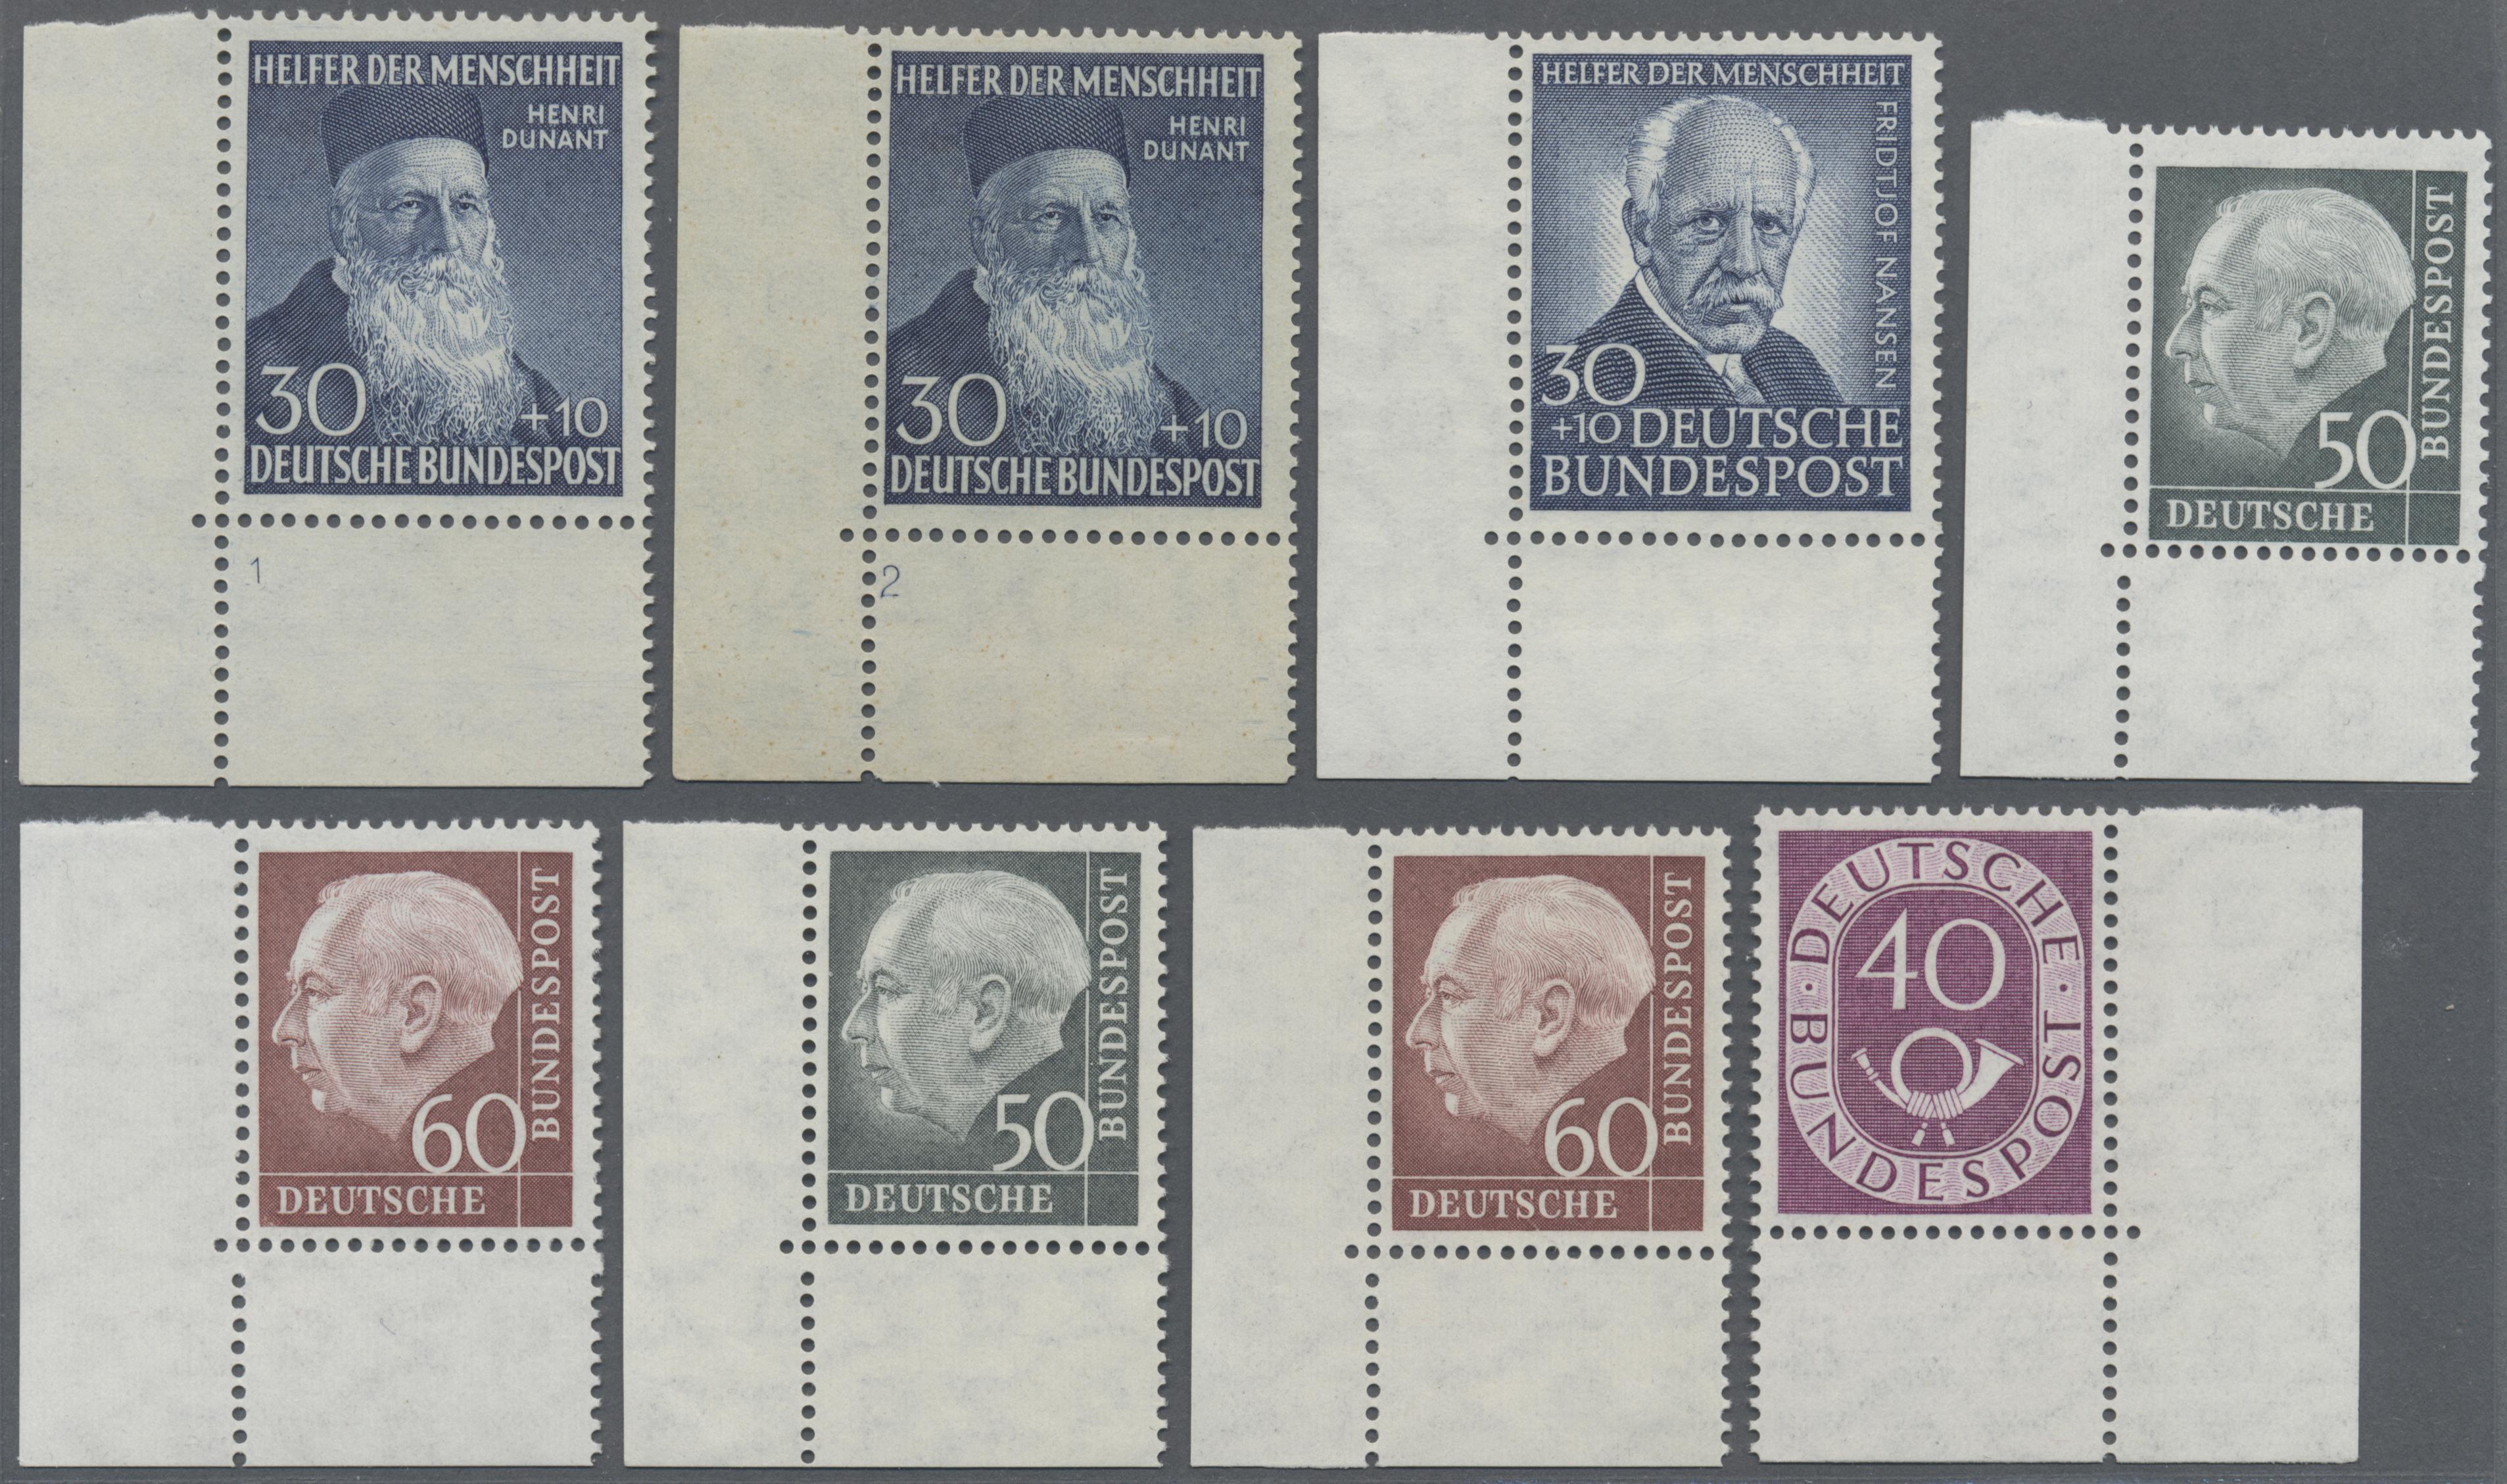 Lot 38093 - bundesrepublik und berlin  -  Auktionshaus Christoph Gärtner GmbH & Co. KG Collections Germany,  Collections Supplement, Surprise boxes #39 Day 7